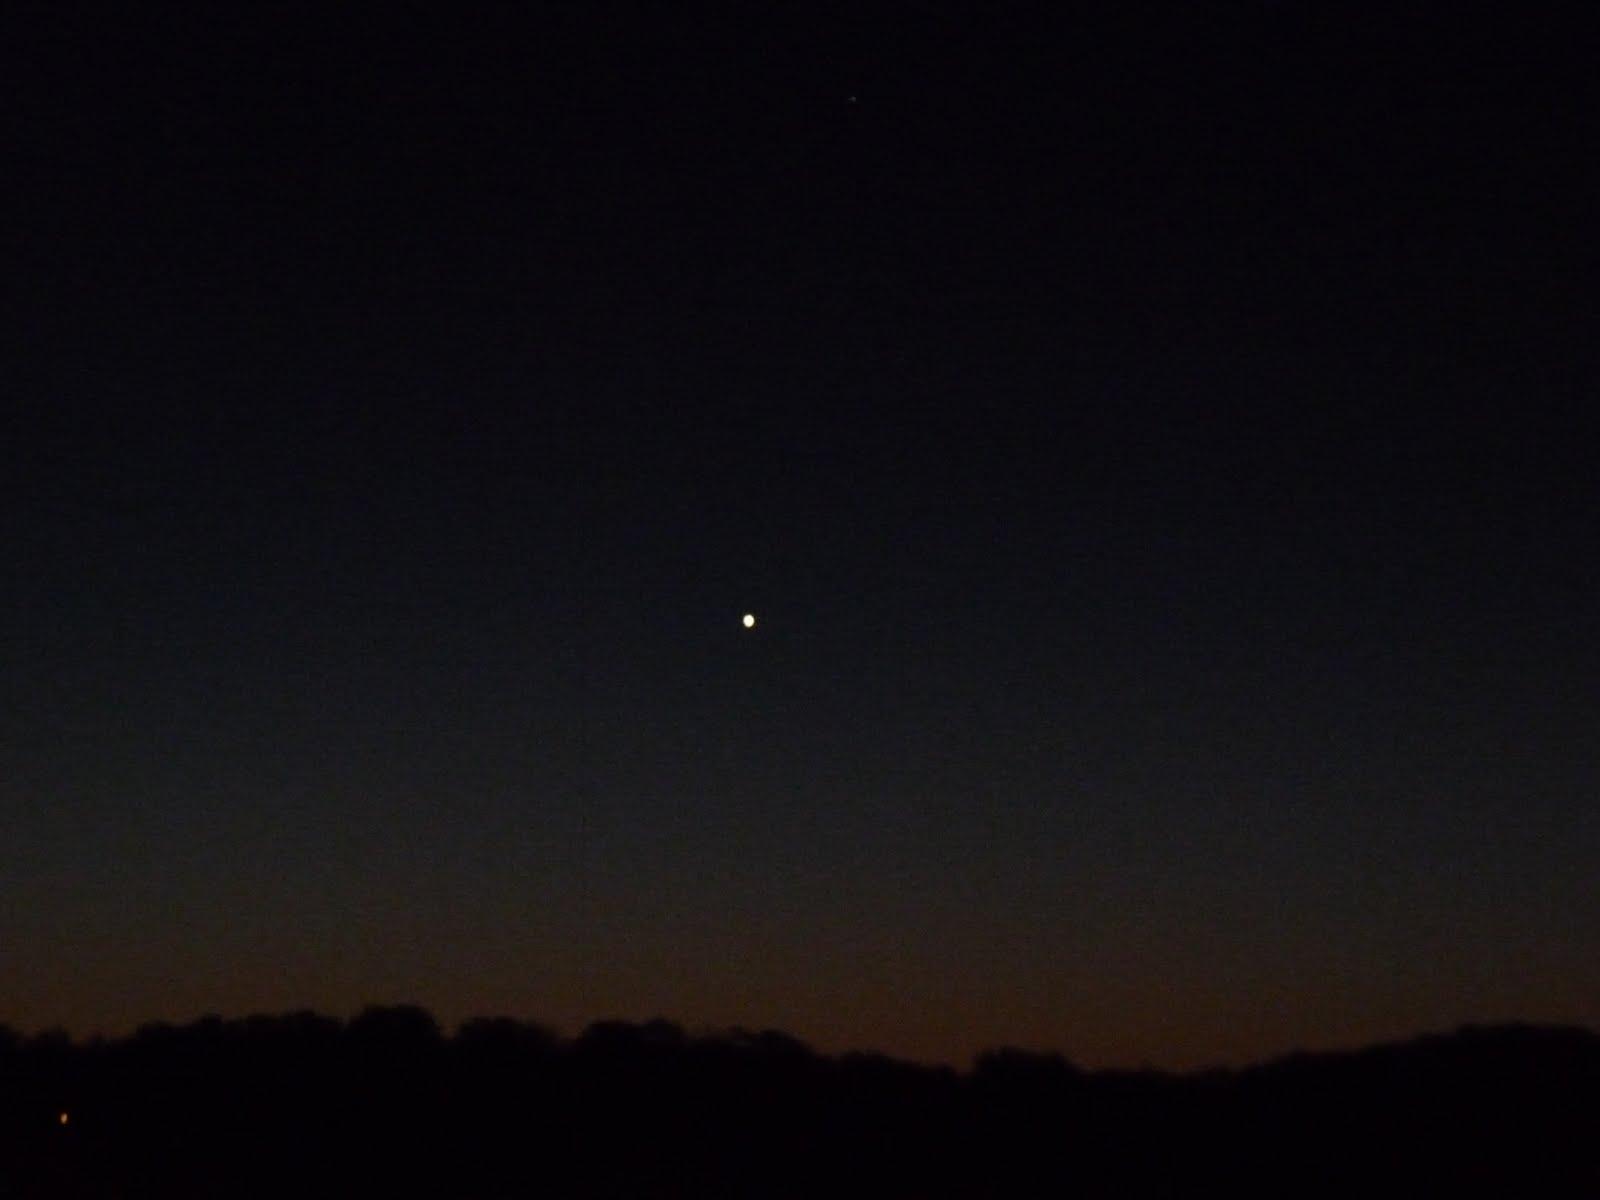 Sky Morning Star as The Morning Star